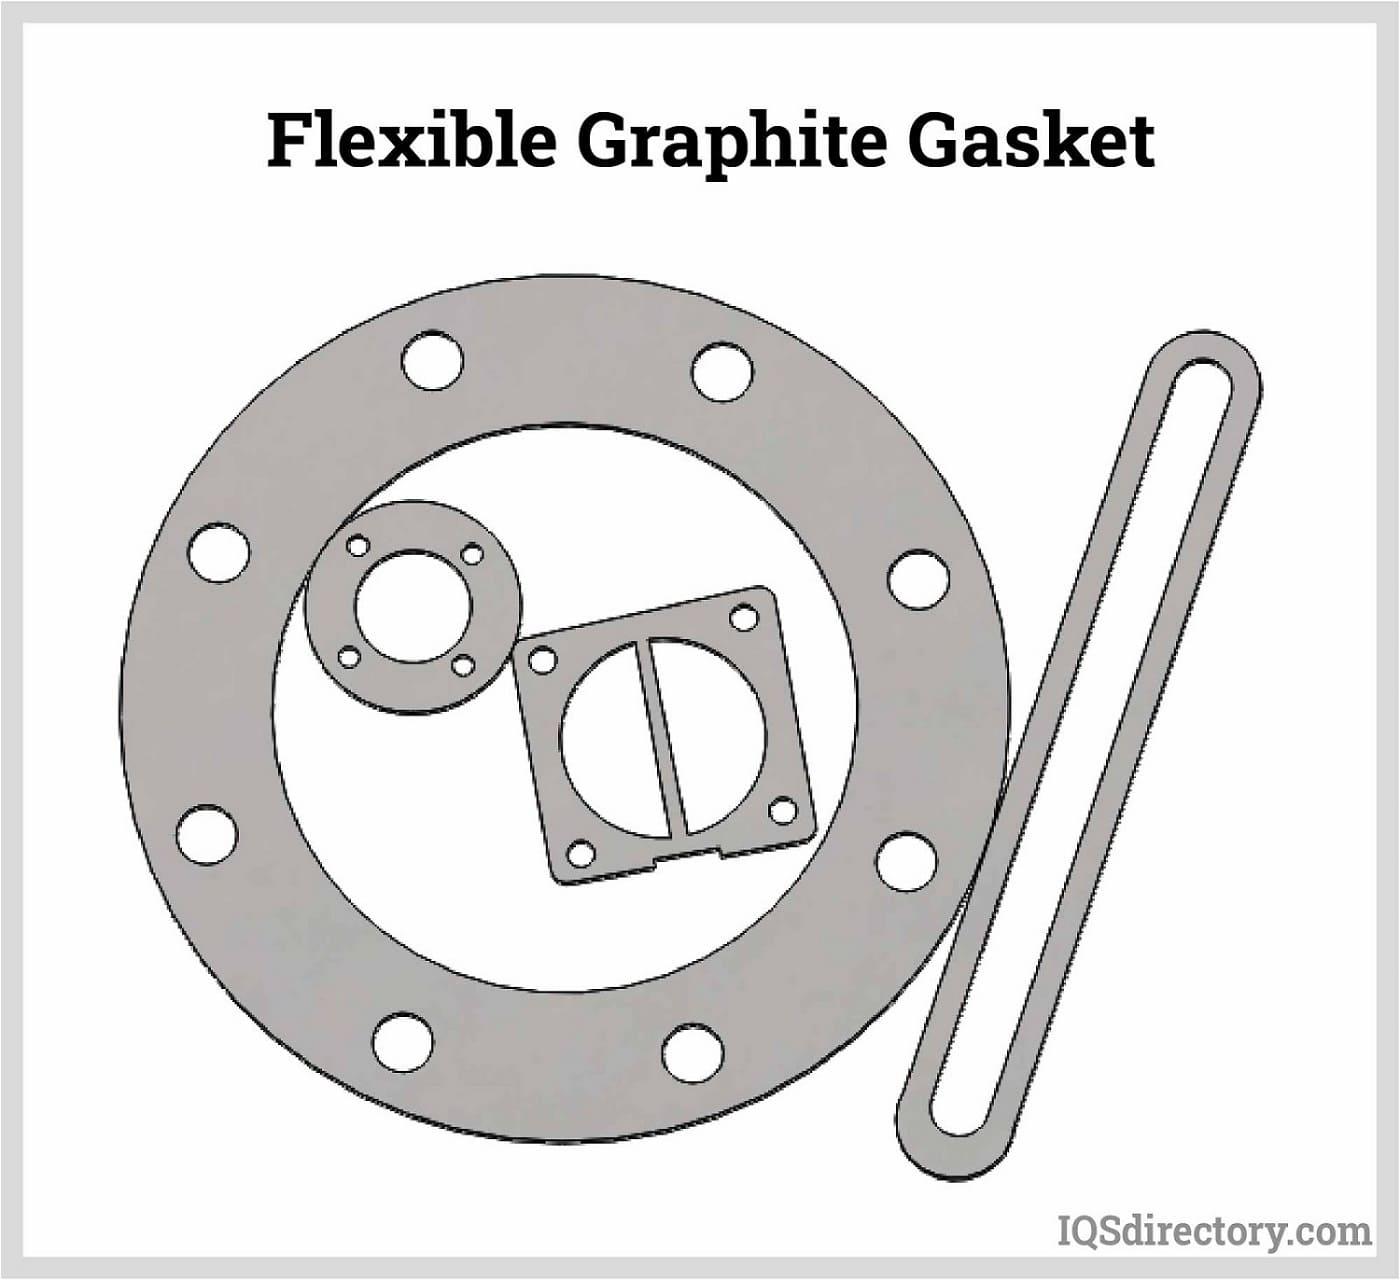 Flexible Graphite Gasket